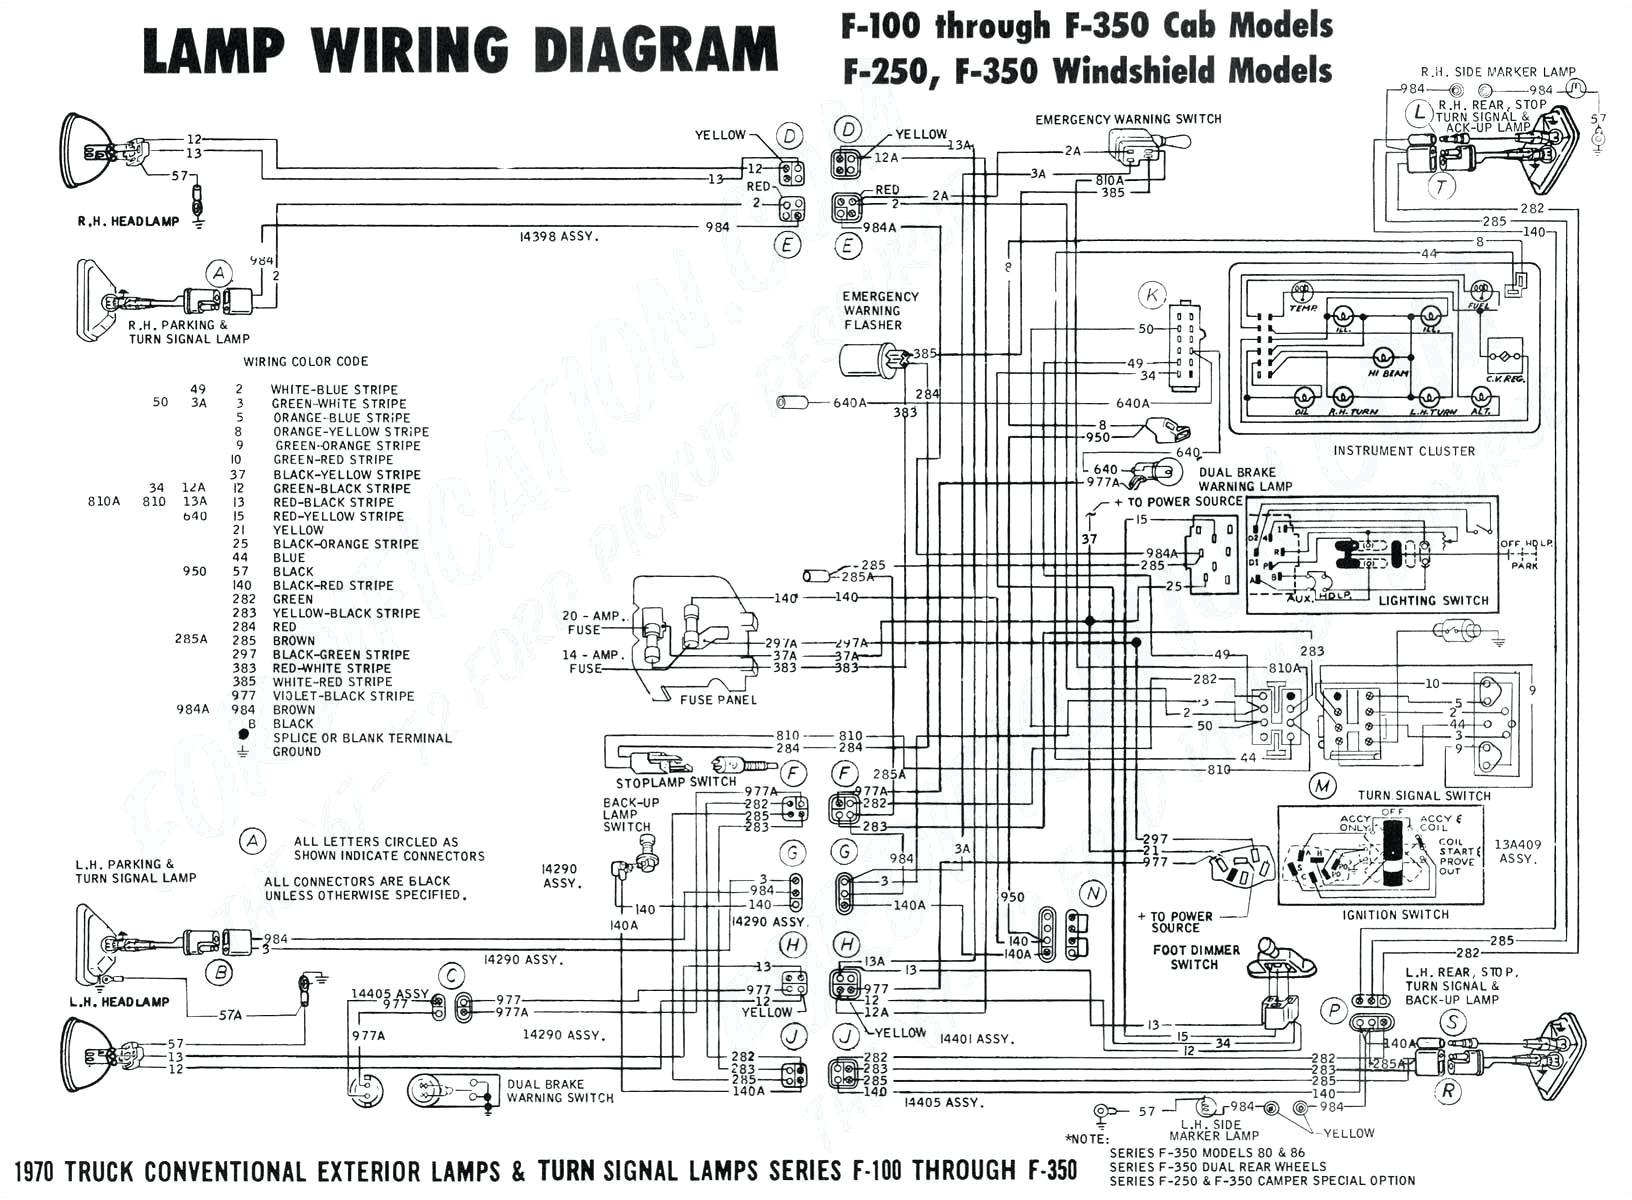 softail wiring diagram wiring diagram wiring sharp diagram rg radio b920a